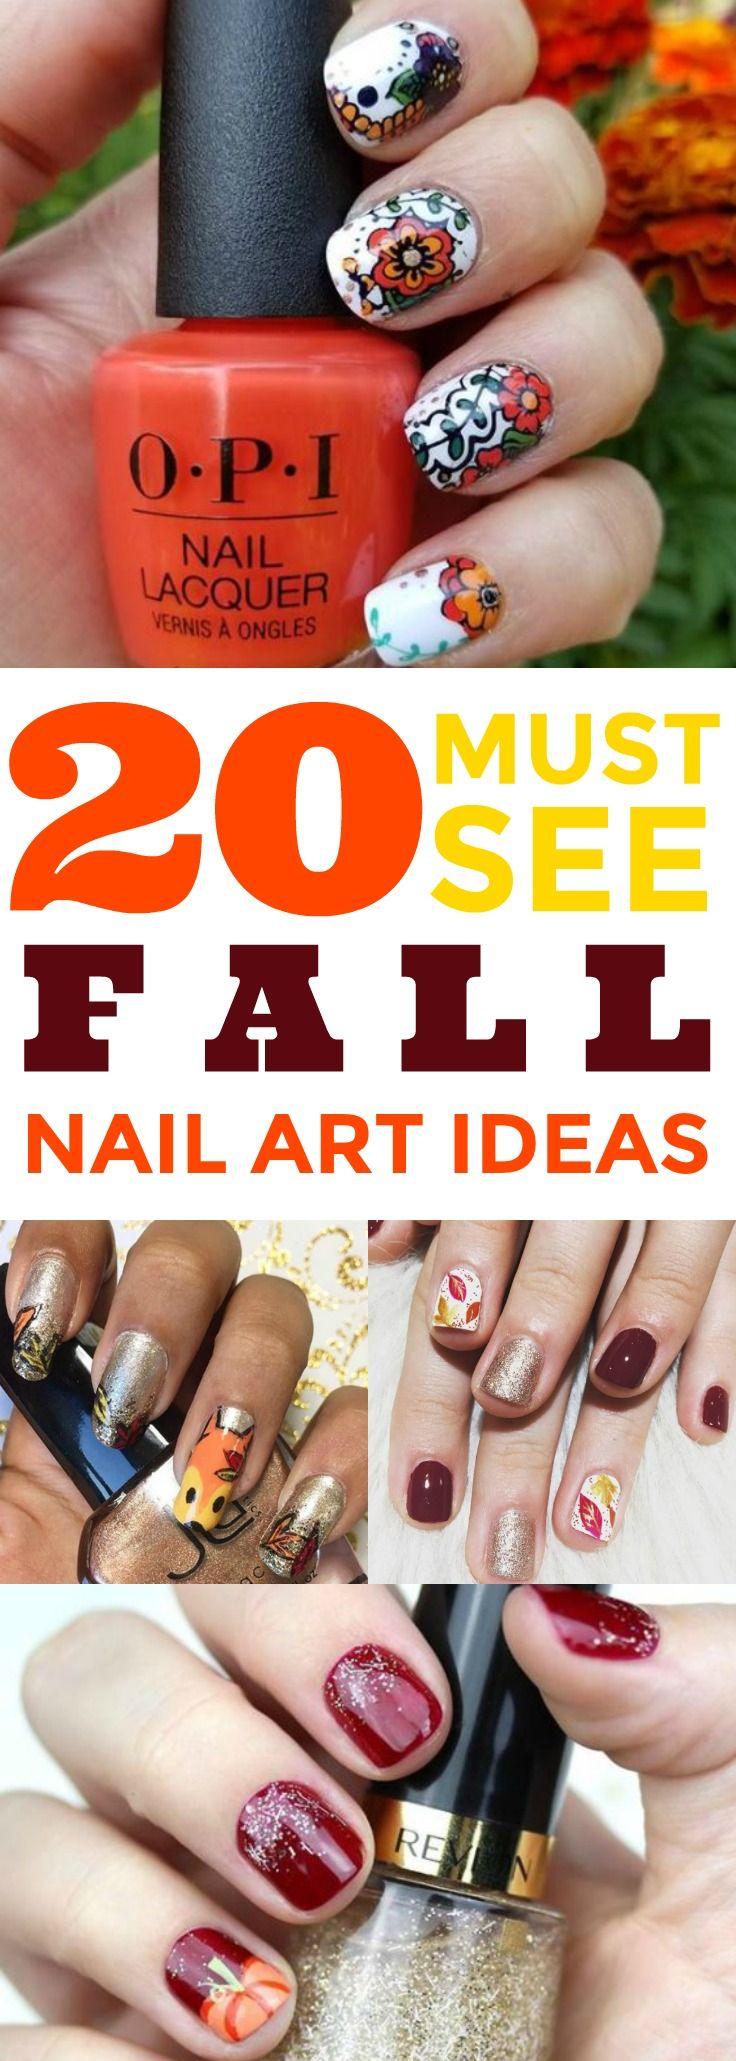 20 fall nail art ideas you will love | autumn nails, beauty nails